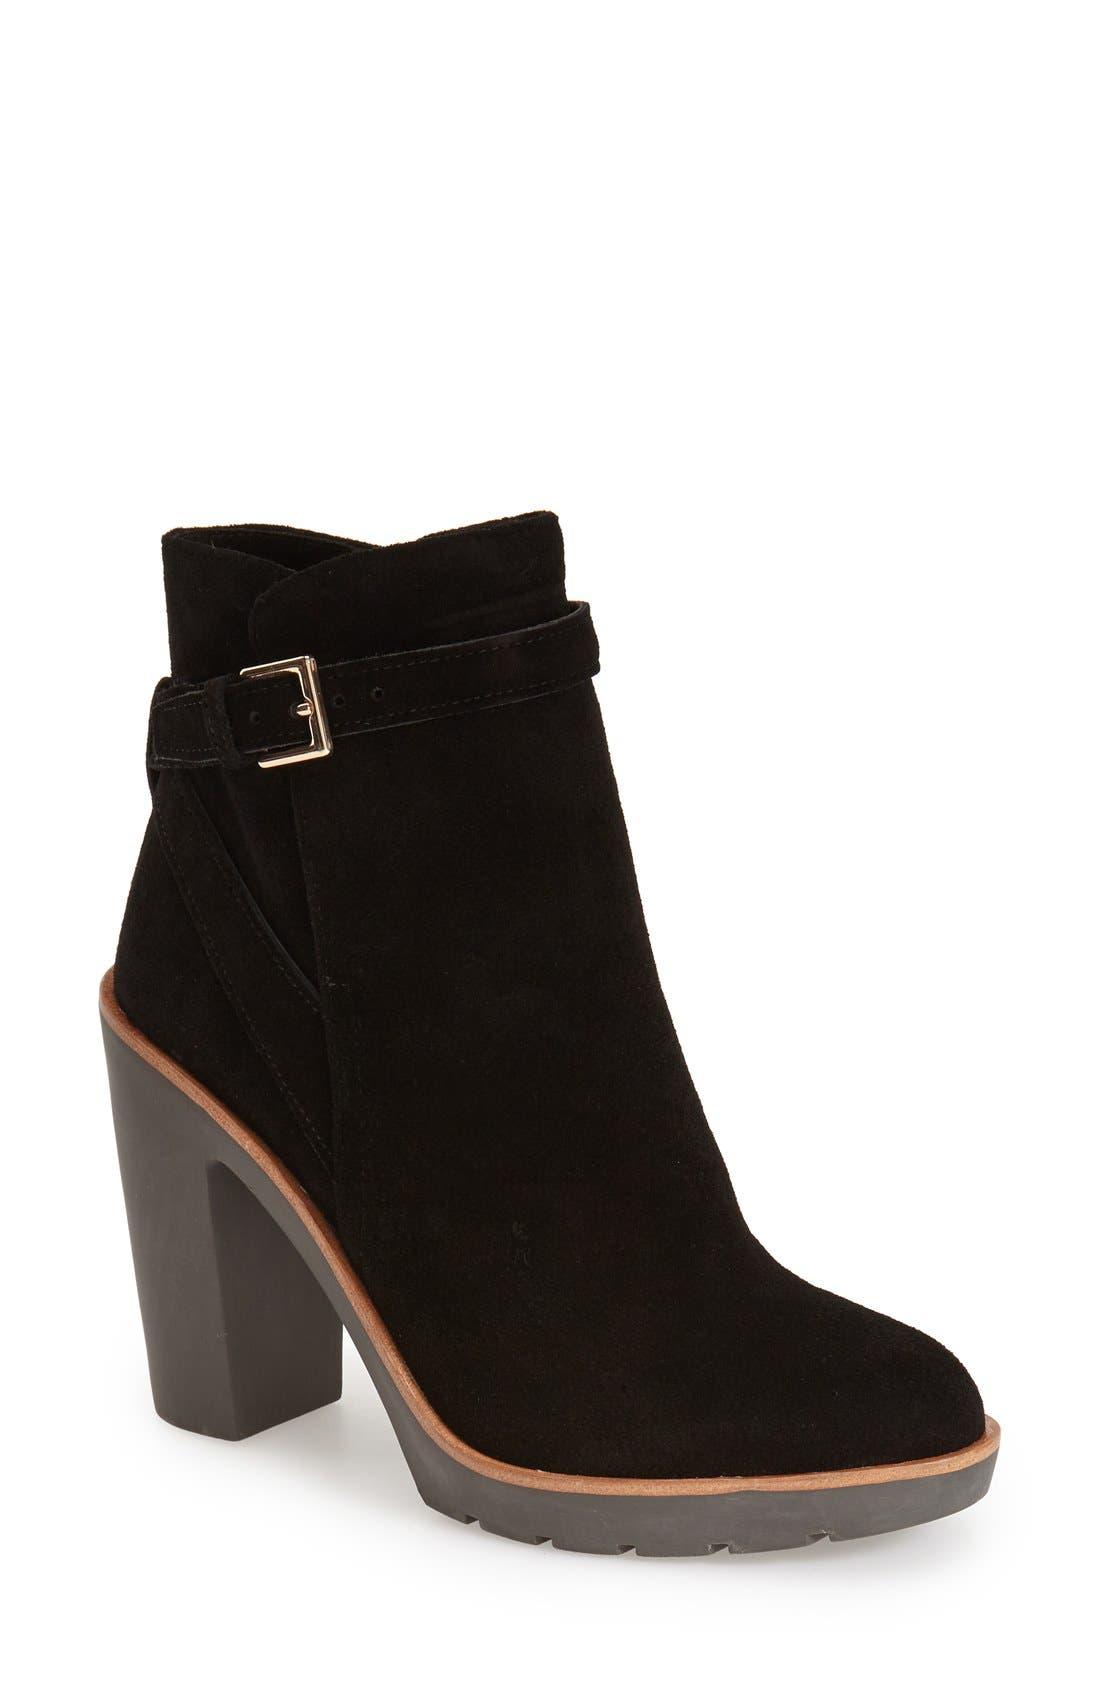 Main Image - kate spade new york 'gem' boot (Women)